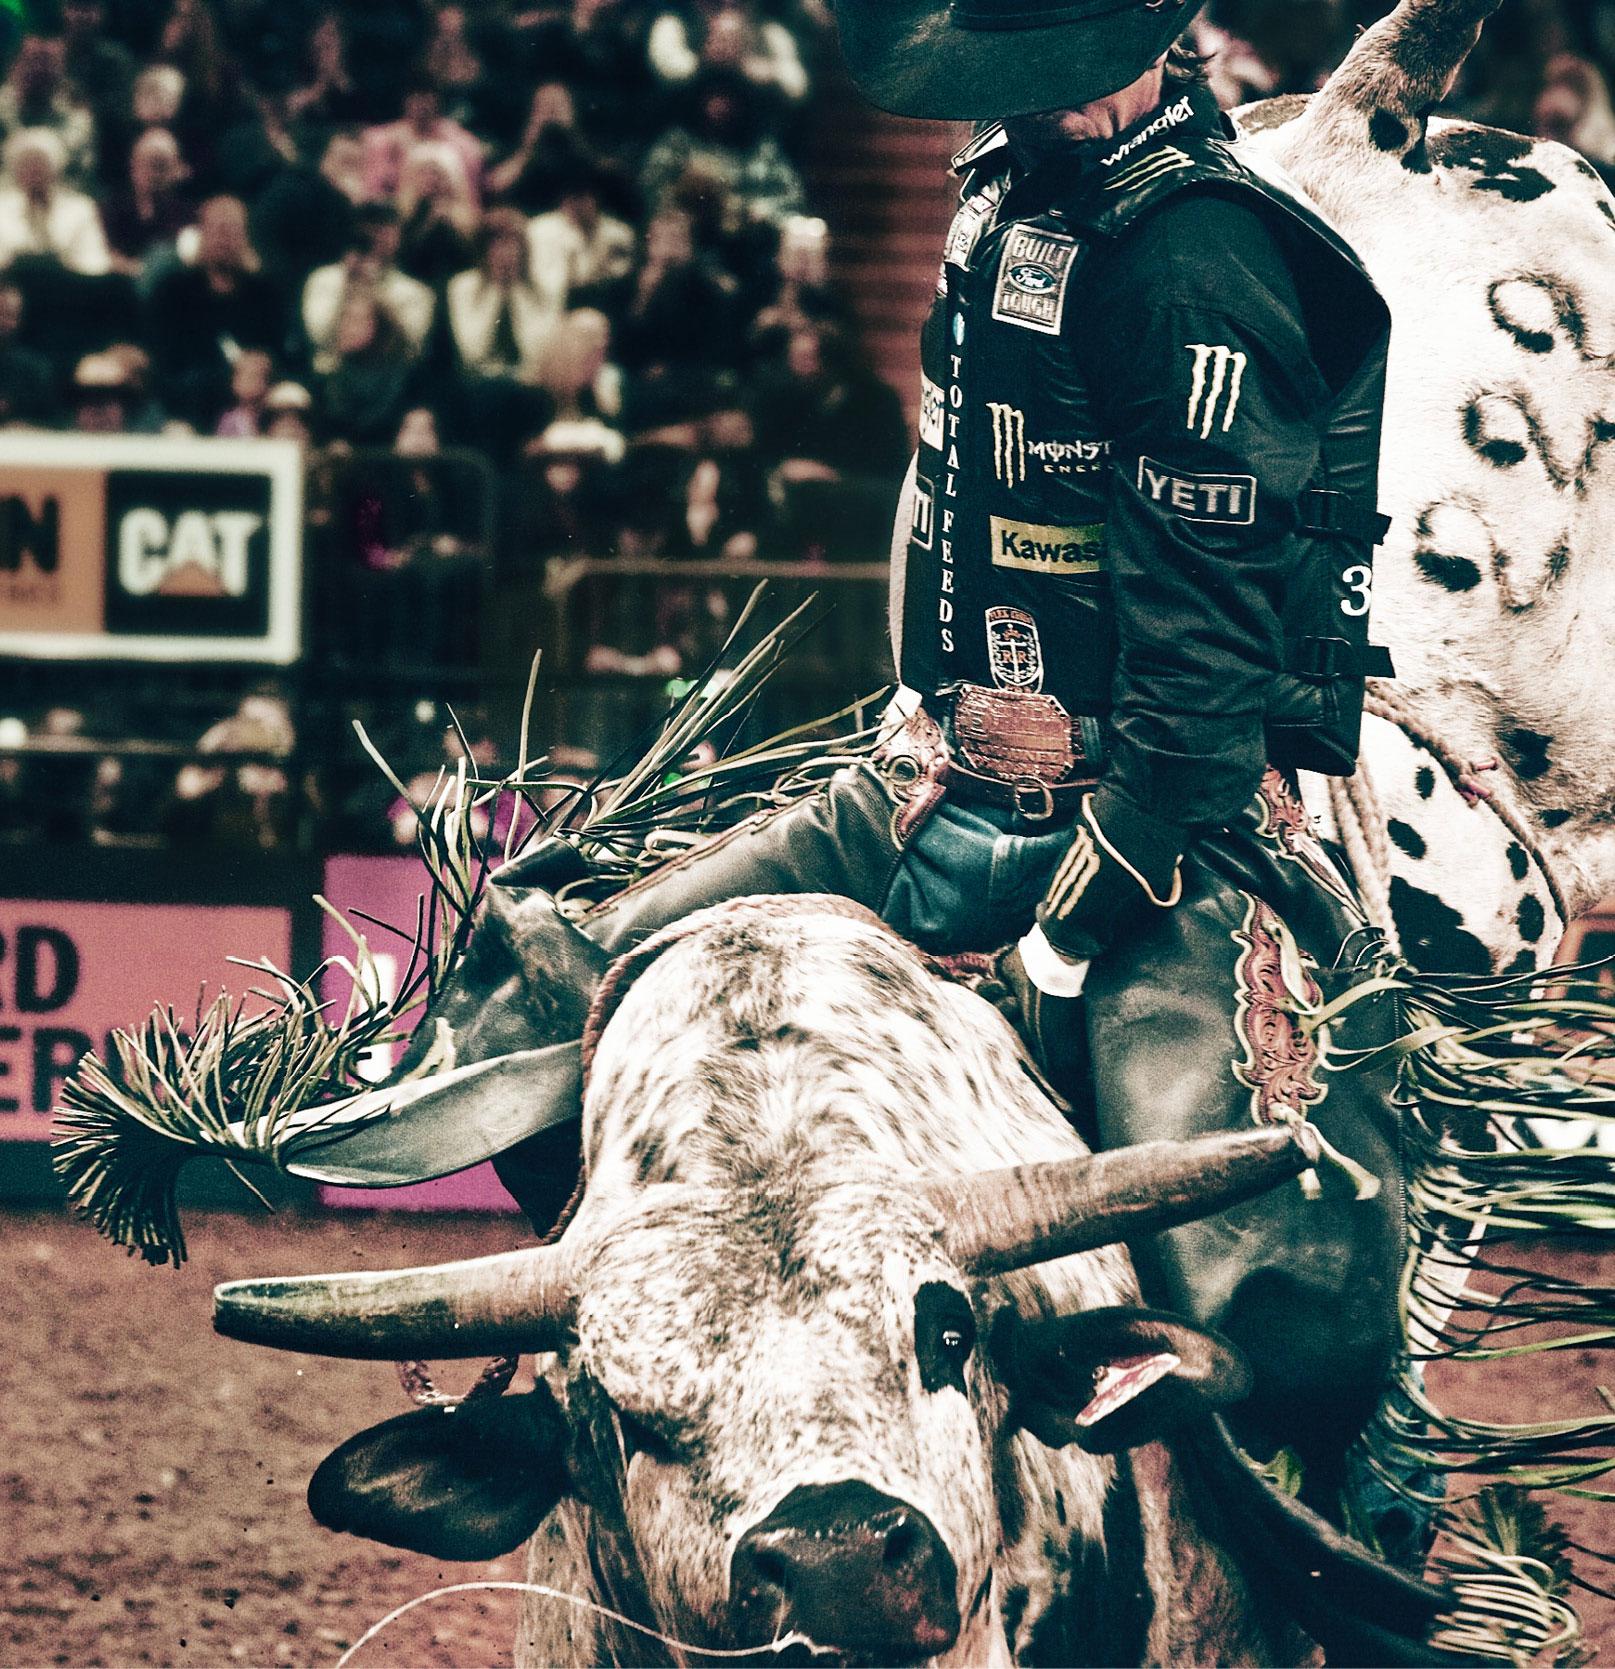 b9a4887e6bd79 The Baddest Bull Ride Has a Secret to Success  Always Pick the Baddest Bull